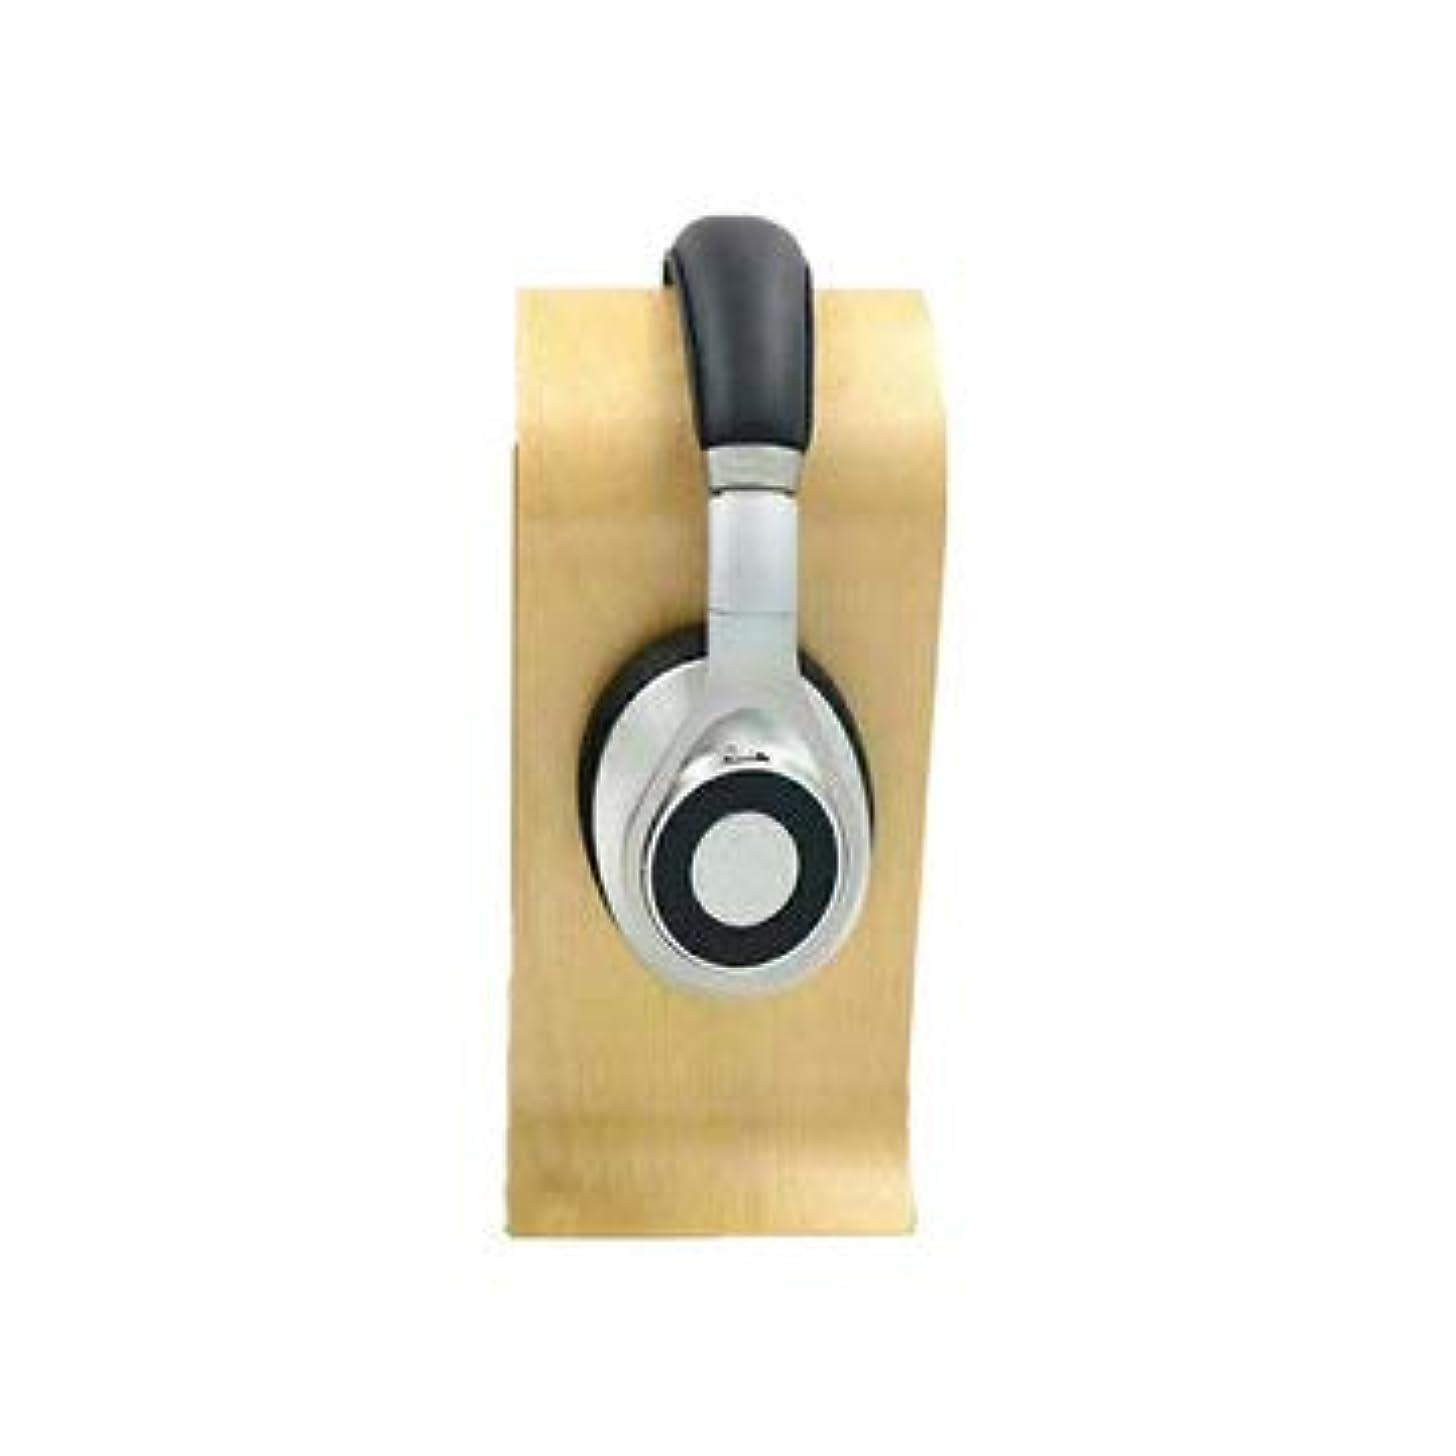 SumoTik Omega Shape Wood Headphone Holder Earphone Stand Hanger Bracket Desk Display Shelf Rack - Earphones & Speakers Headphones - (Wood) 1 X Headphone Holder